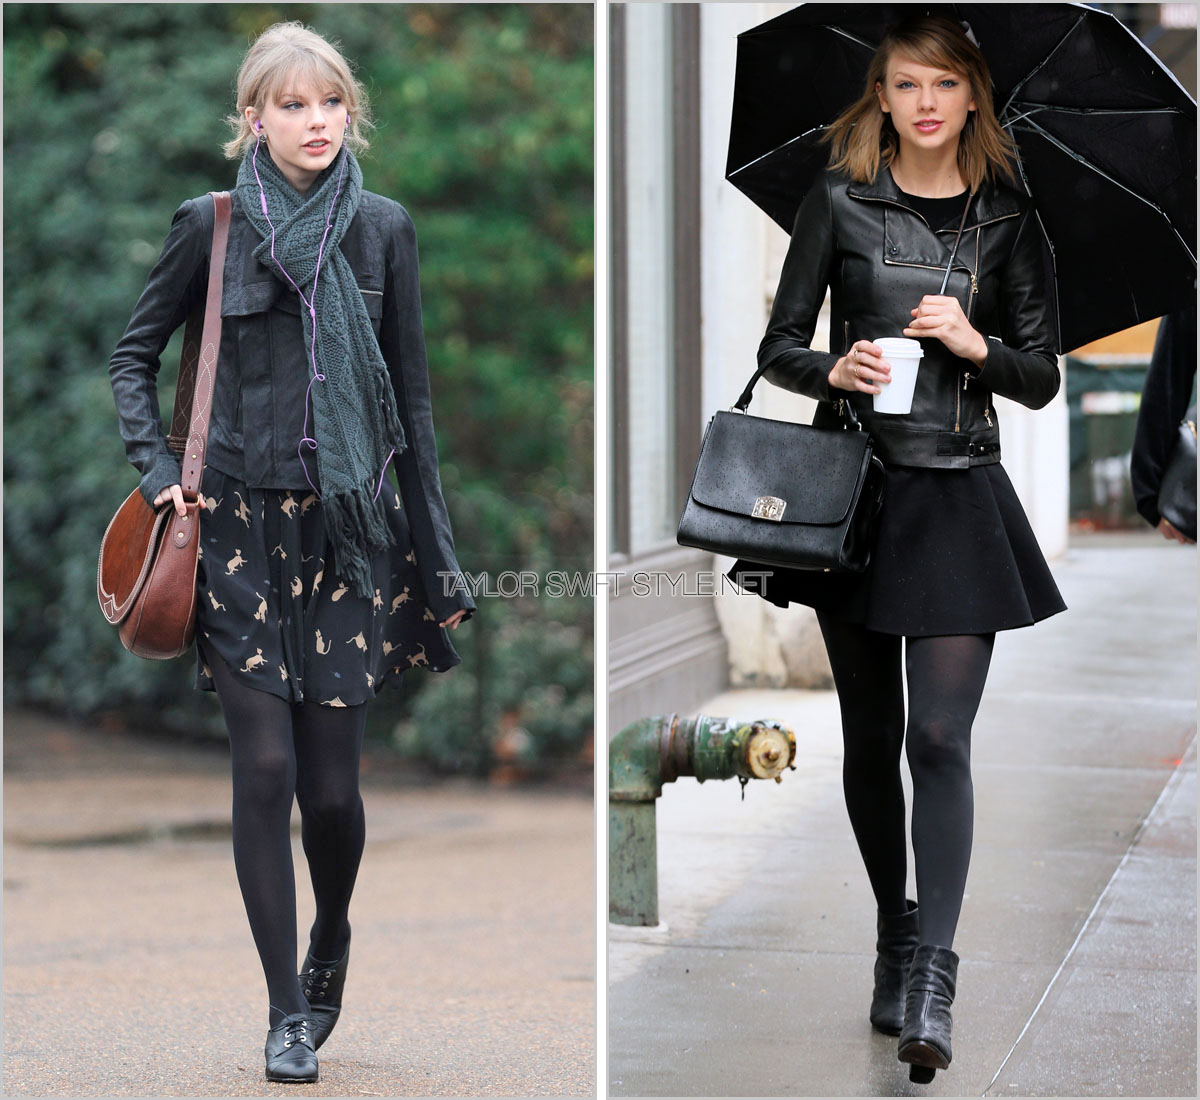 taylor swift black leather jacket styles